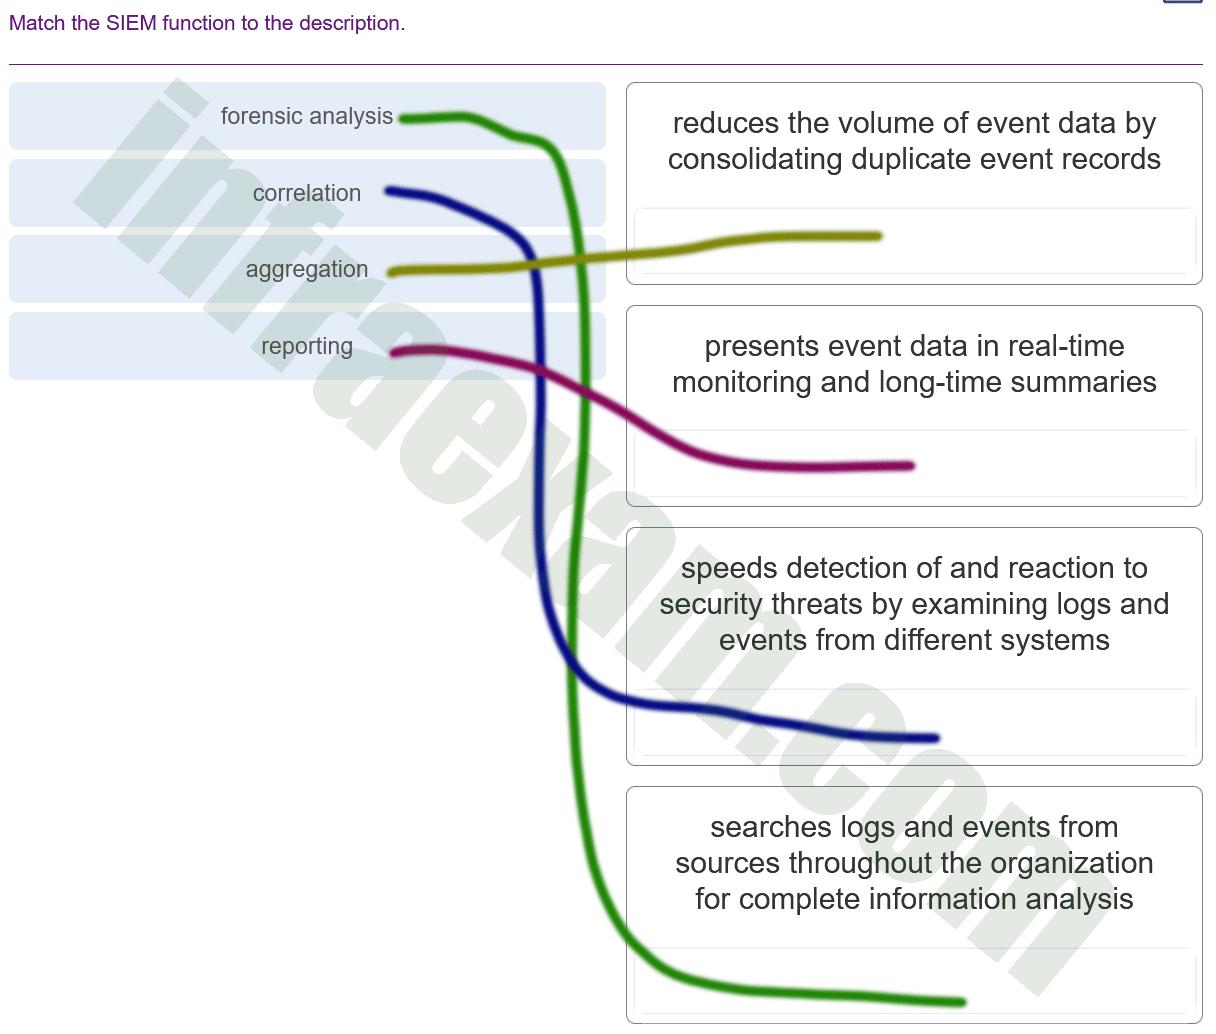 CyberOps Associate (Version 1.0) - CyberOps Associate 1.0 Final exam Answers 009